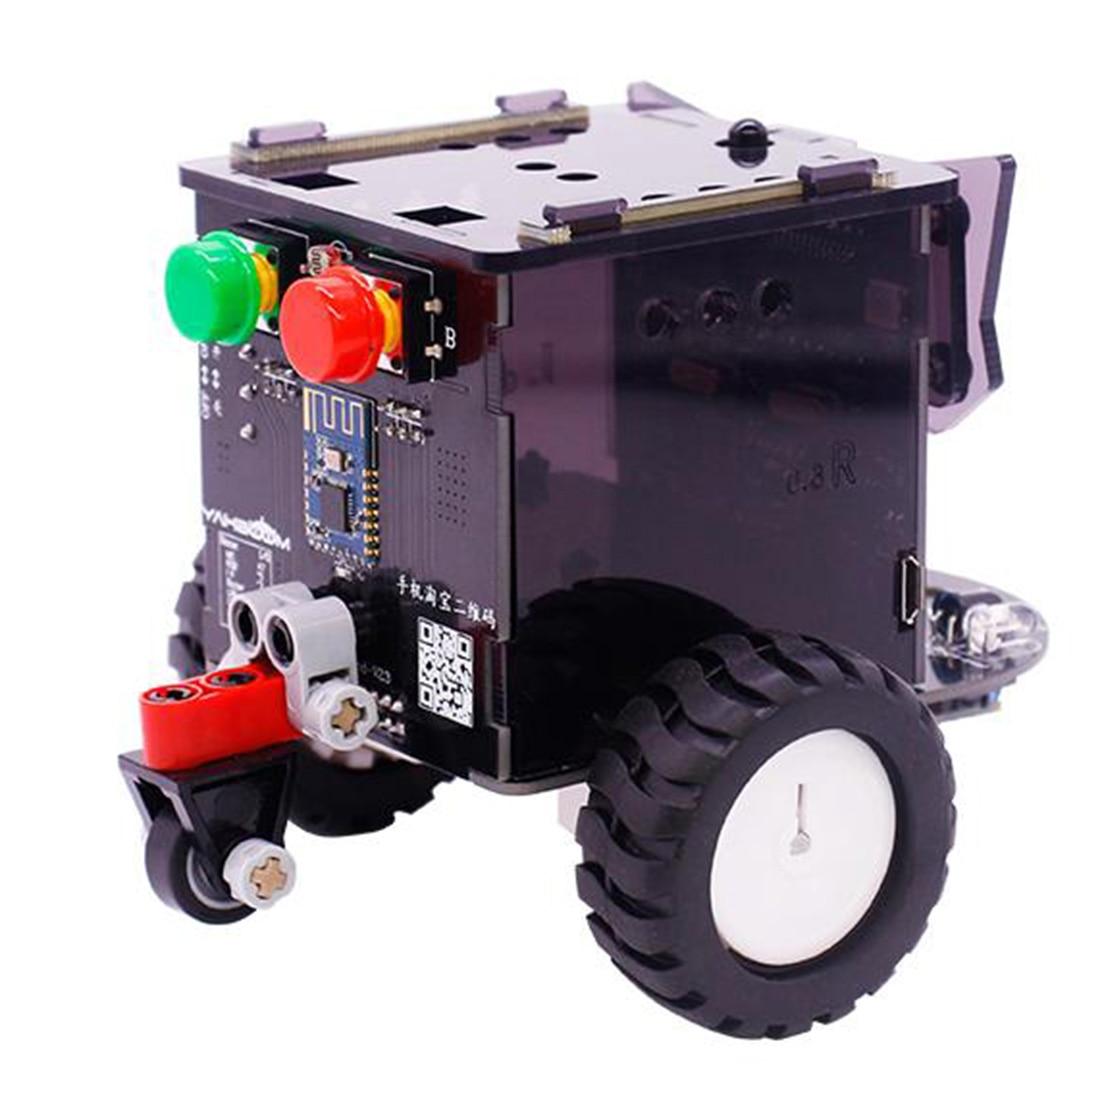 New Standard Version Omibox Scratch Programmable Robot Car Electronic DIY Stem Gift Toy Kit